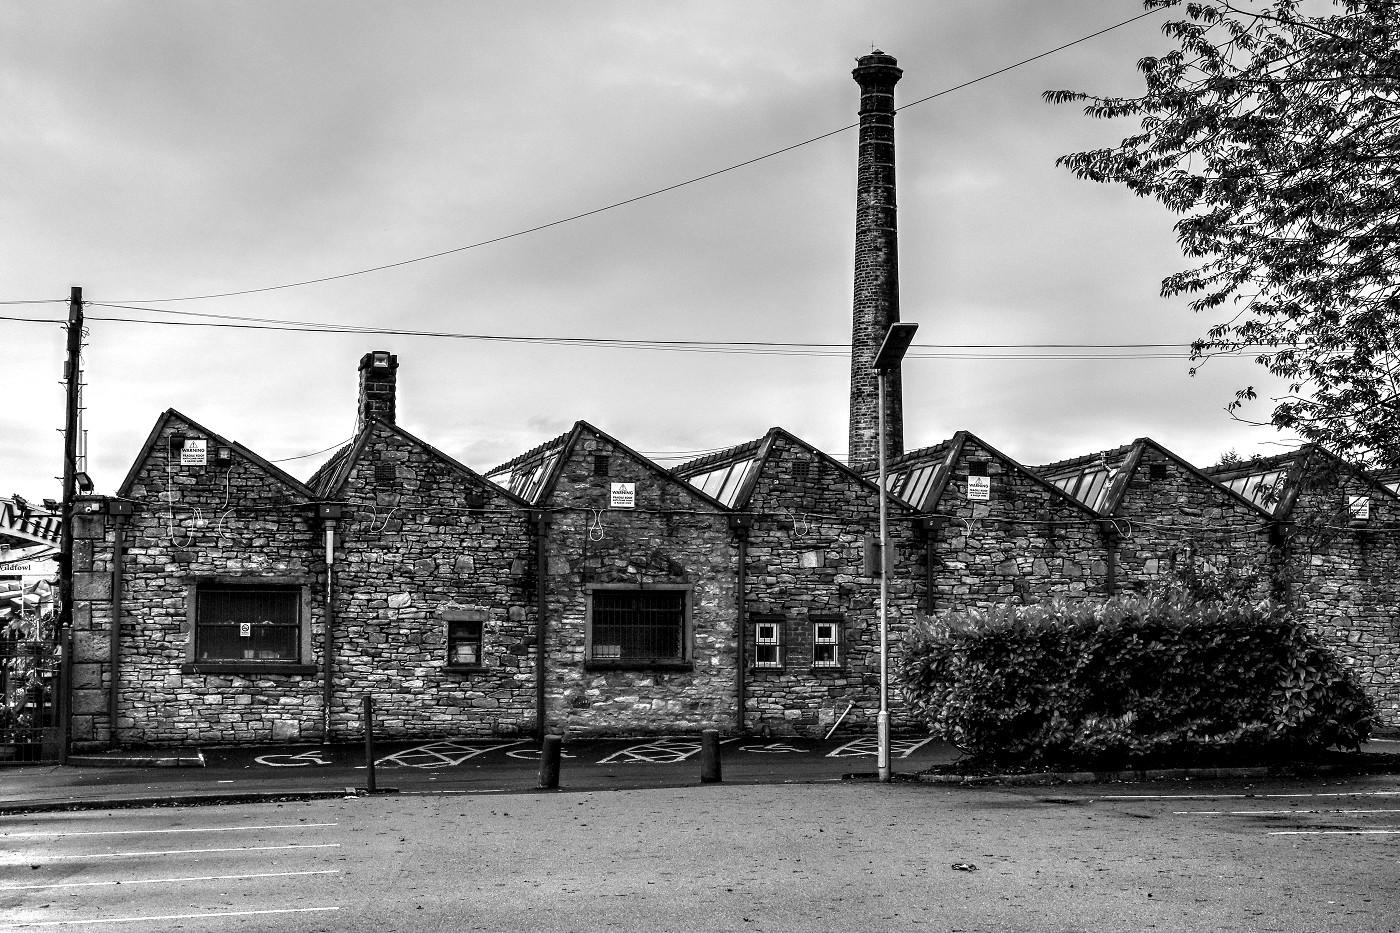 ossy-mills-6702.jpg